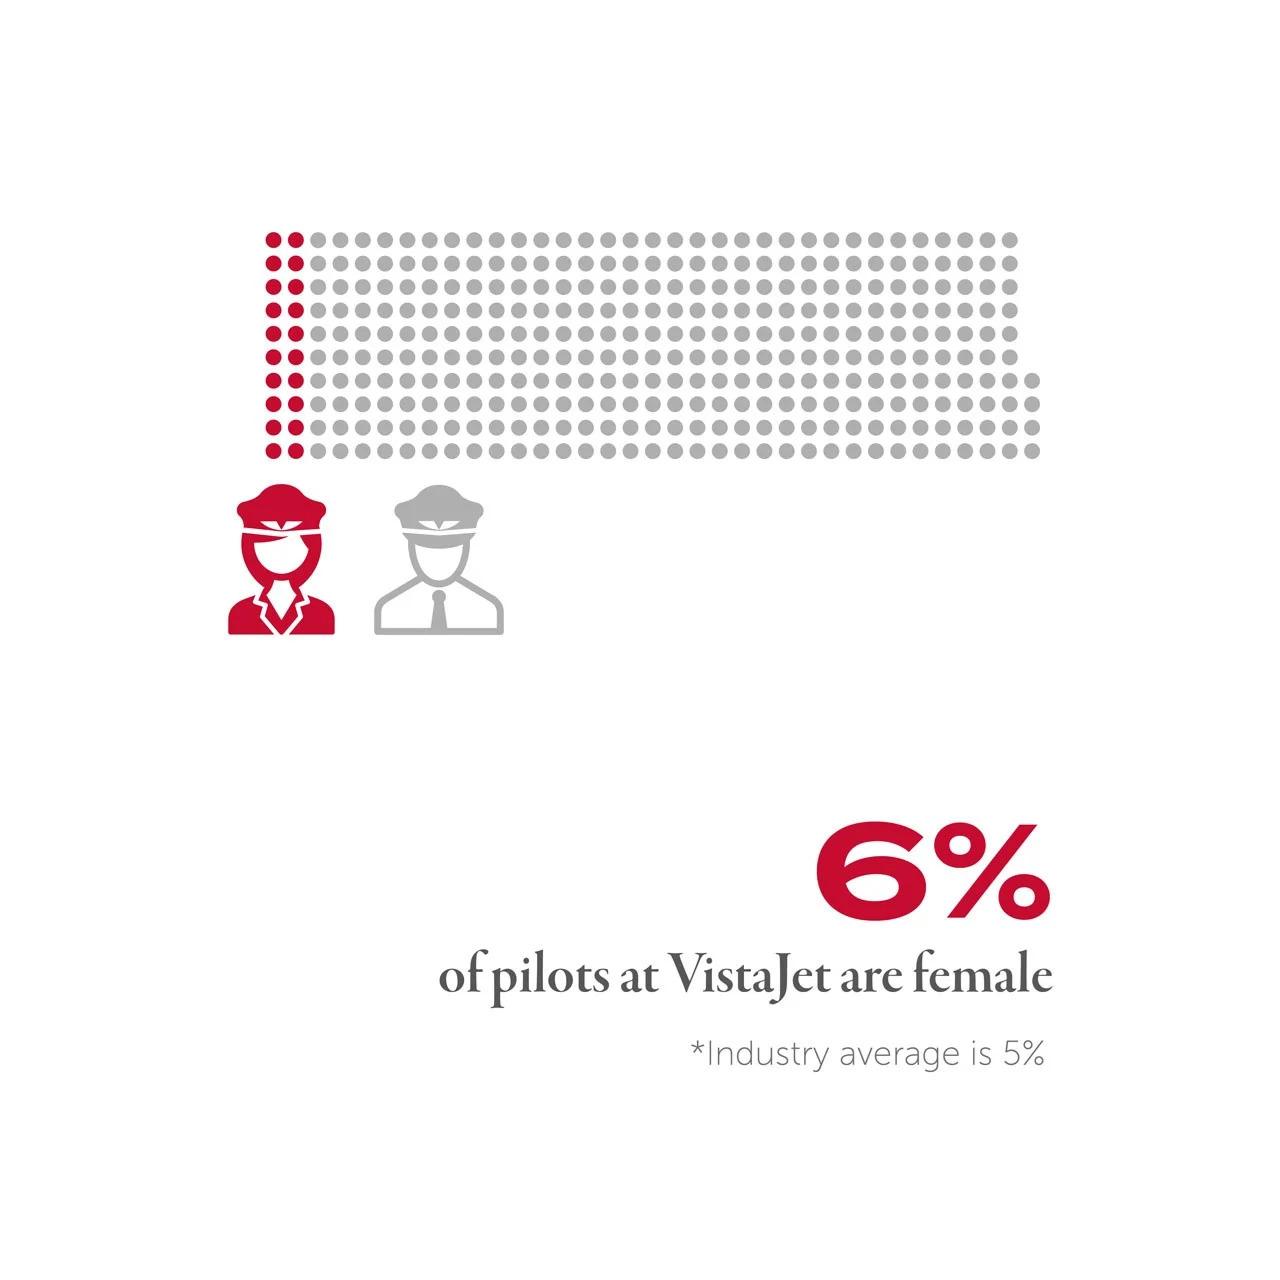 6% VistaJet Pilots are Female